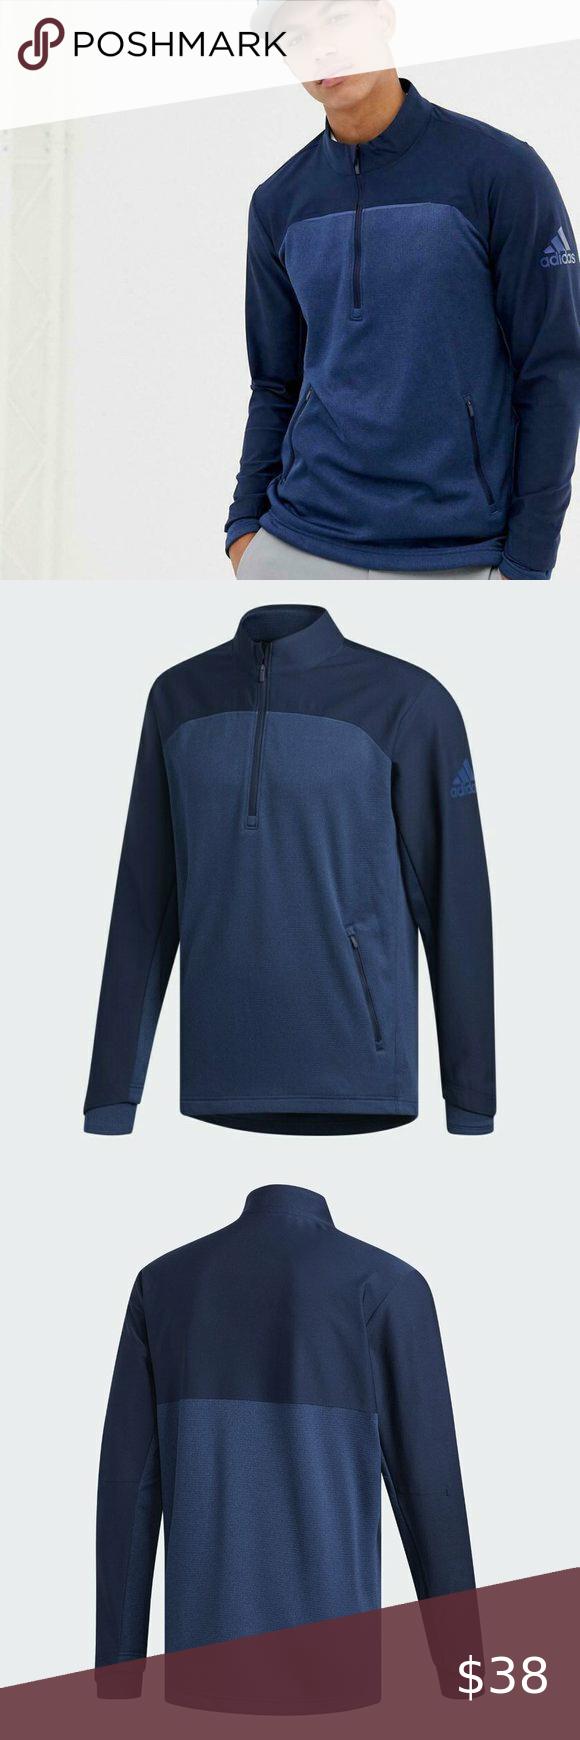 24++ Adidas golf go to 1 4 zip viral